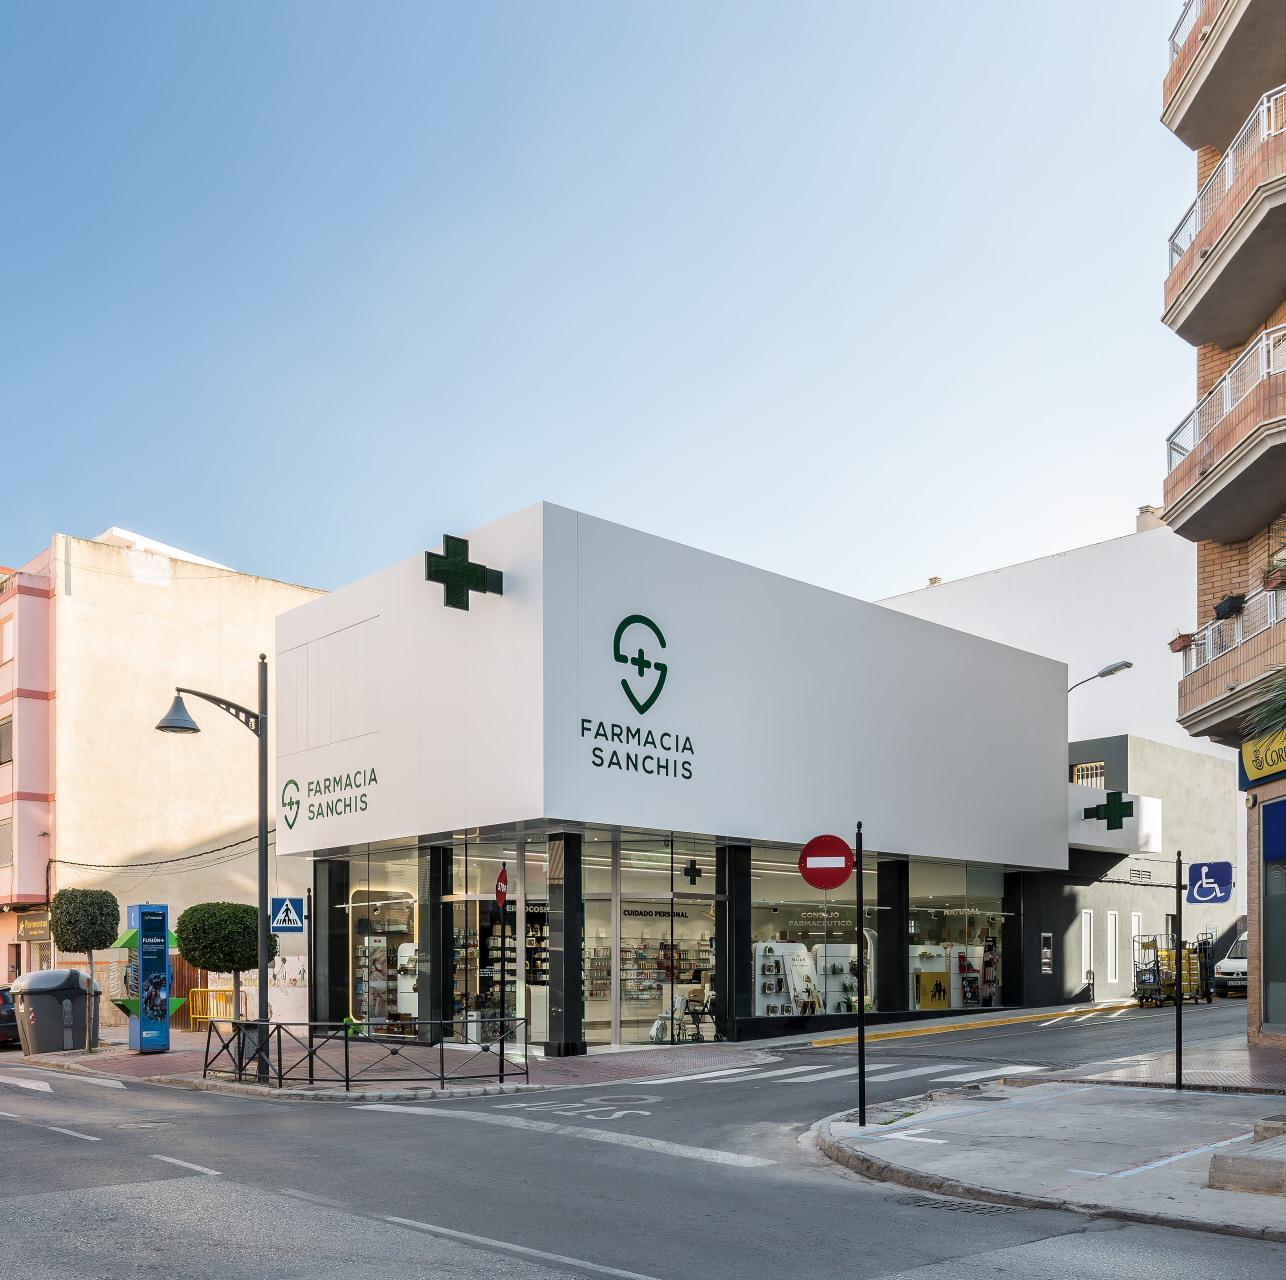 fotografia-arquitectura-valencia-german-cabo-d'estudio-farmacia-sanchis-ribarroja (3)